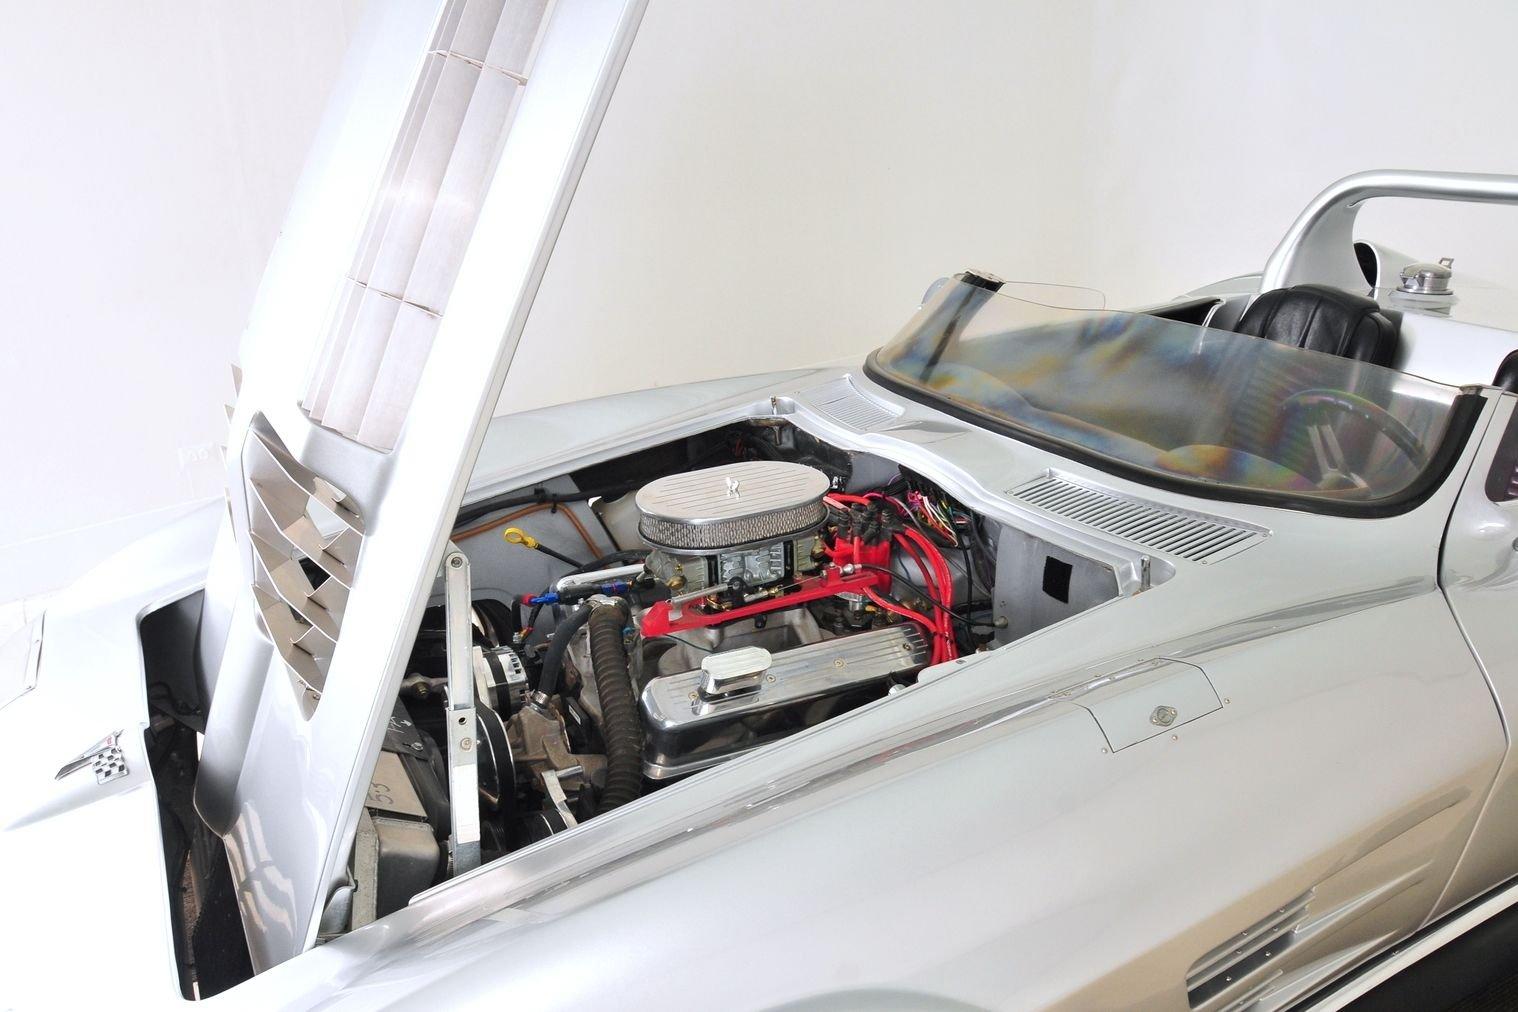 1963 Chevrolet Corvette Mongoose Motorsports Grand Sport Fast Five engine bay